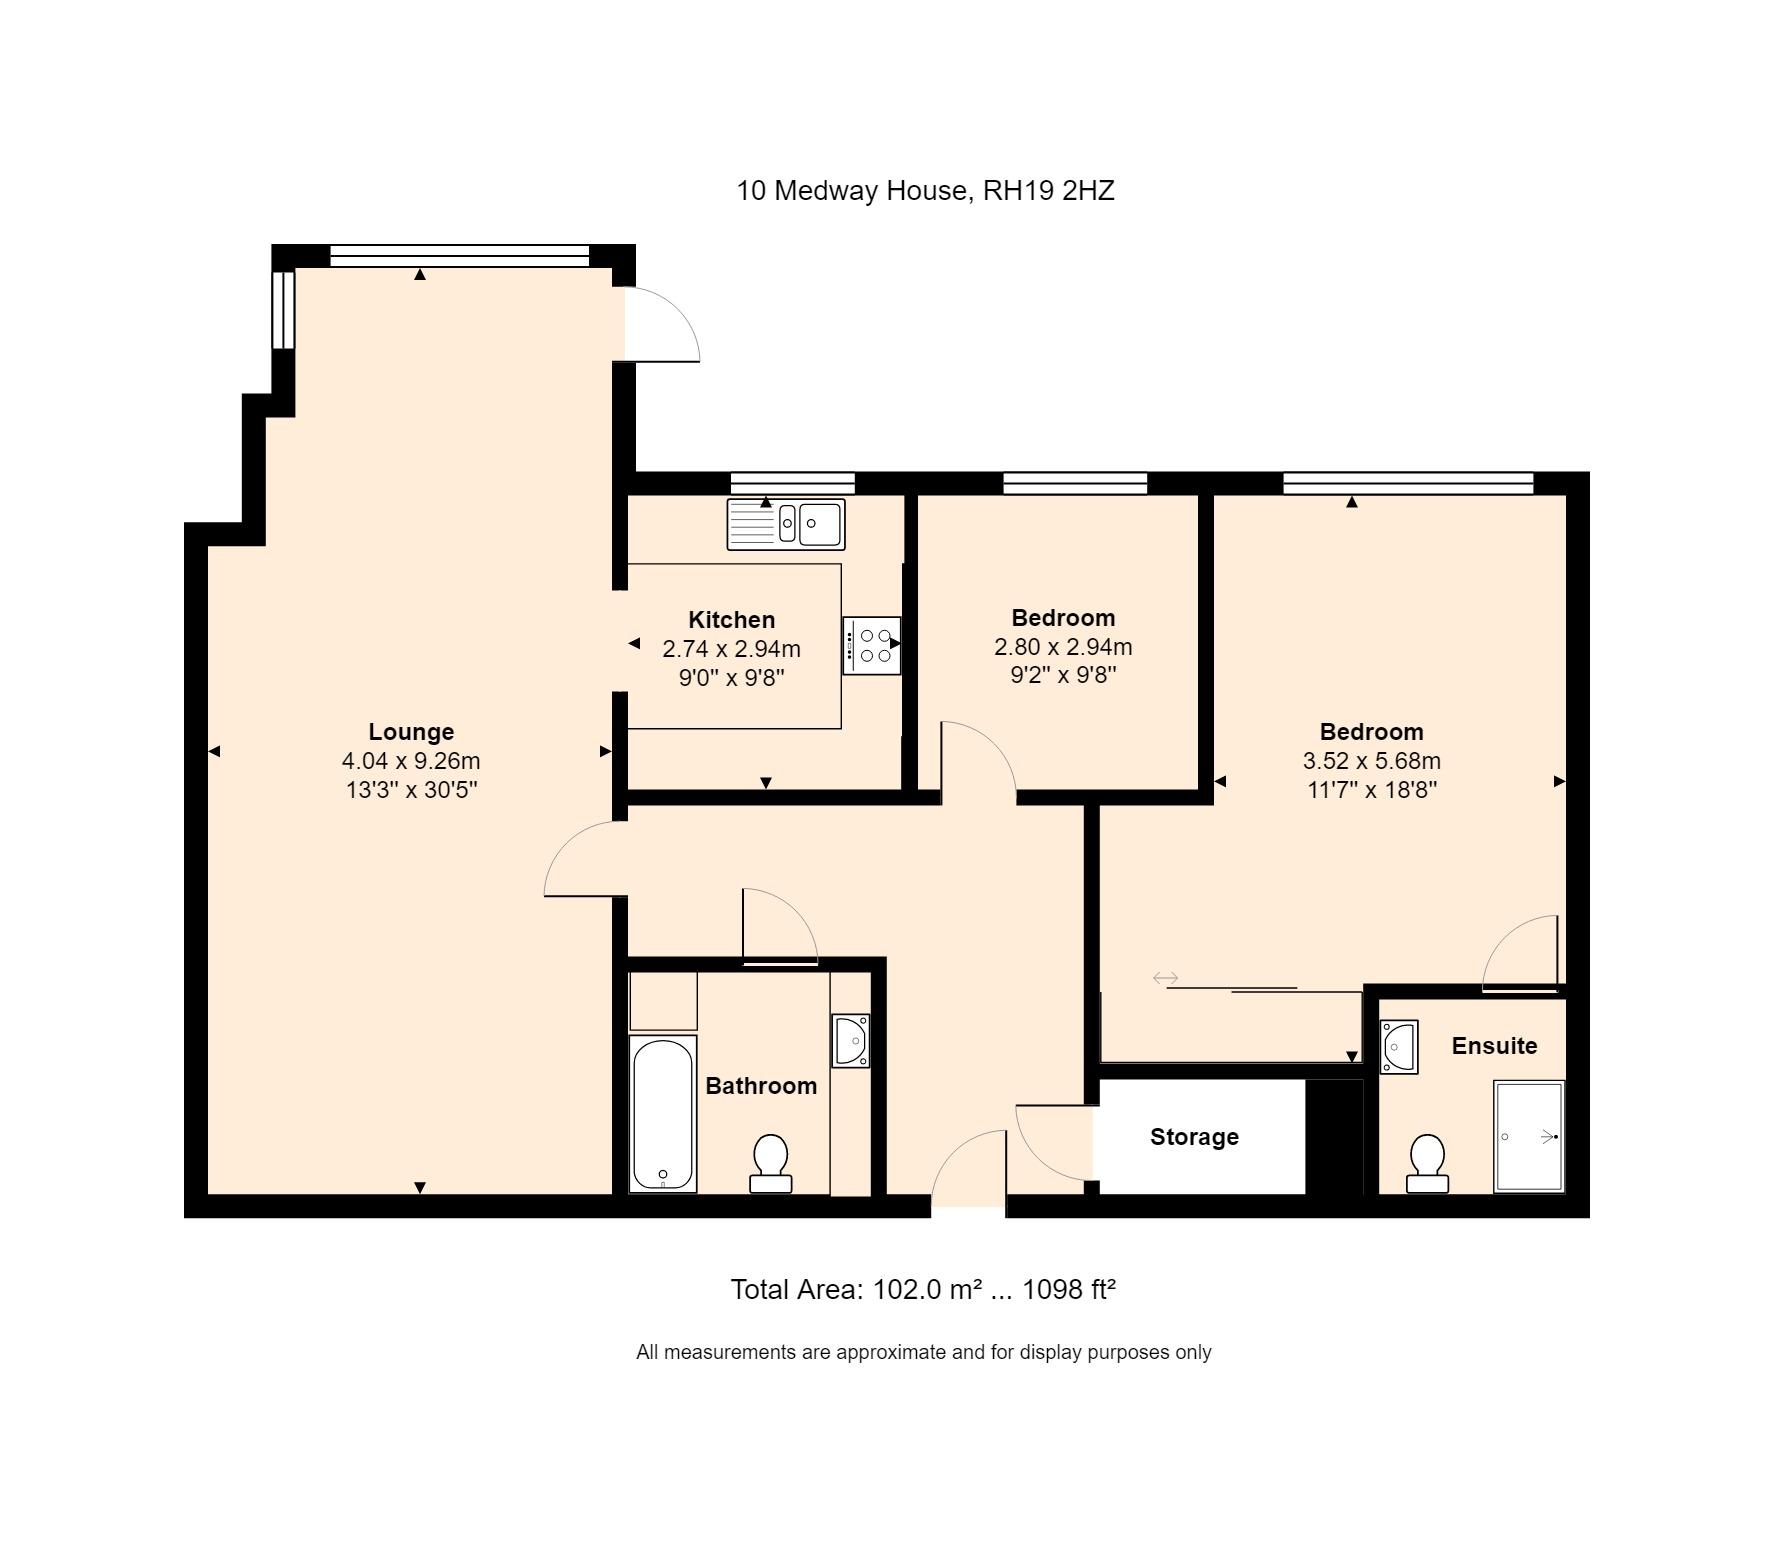 10 Medway House Floorplan